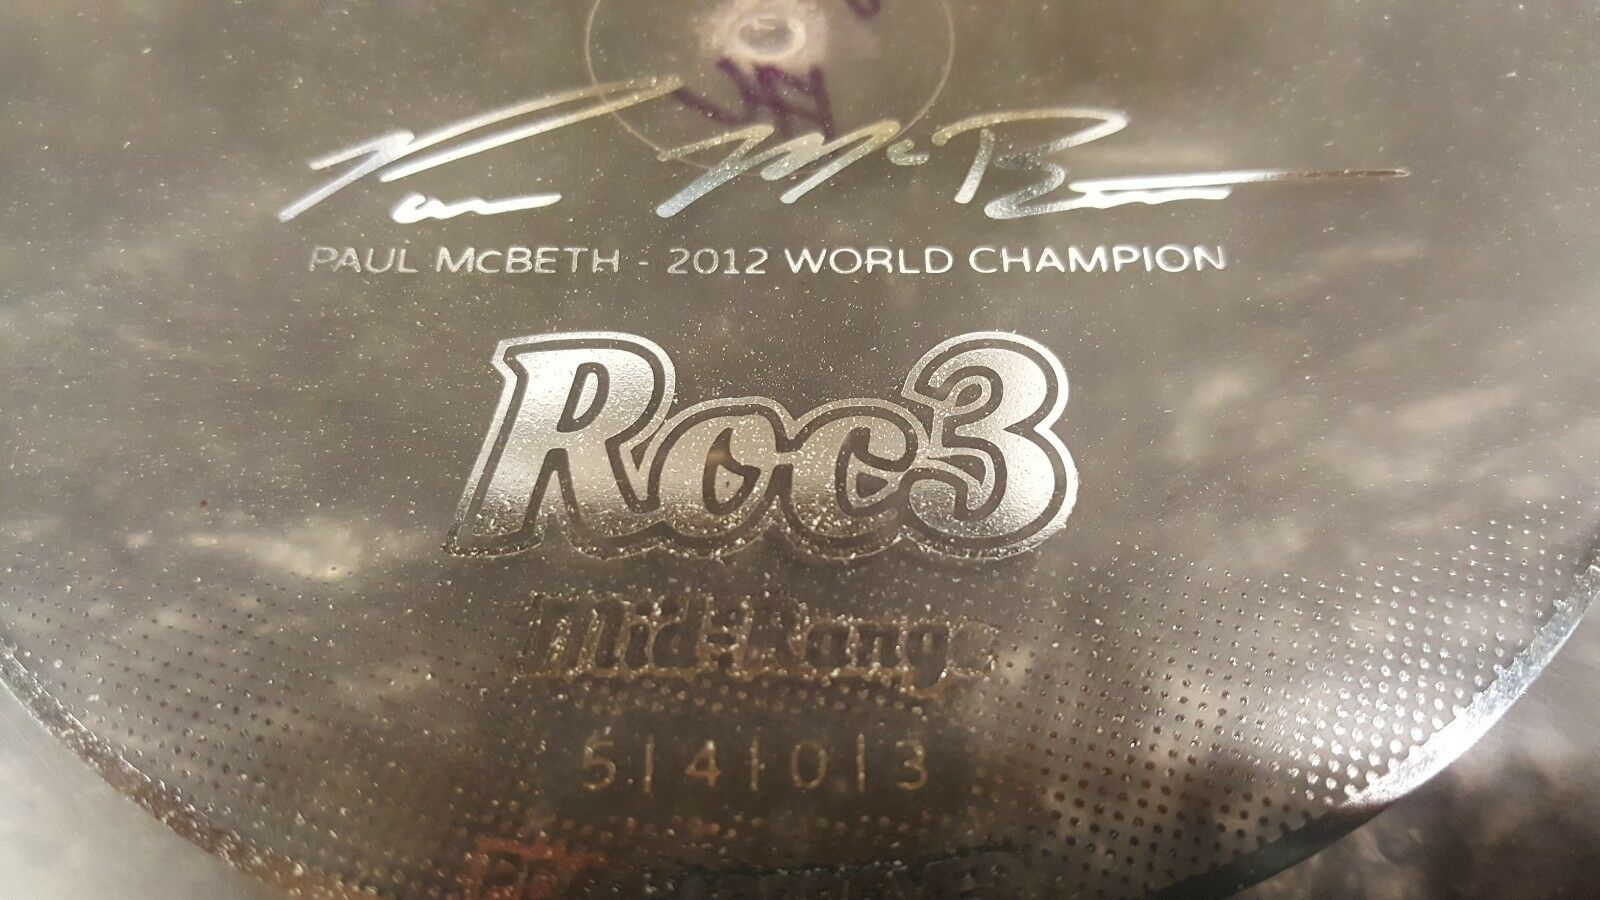 Innova Roc3 paul paul paul mcbeth 1x 2x 3x Champion star Disc Lot destroyer grand slam   0a9e56